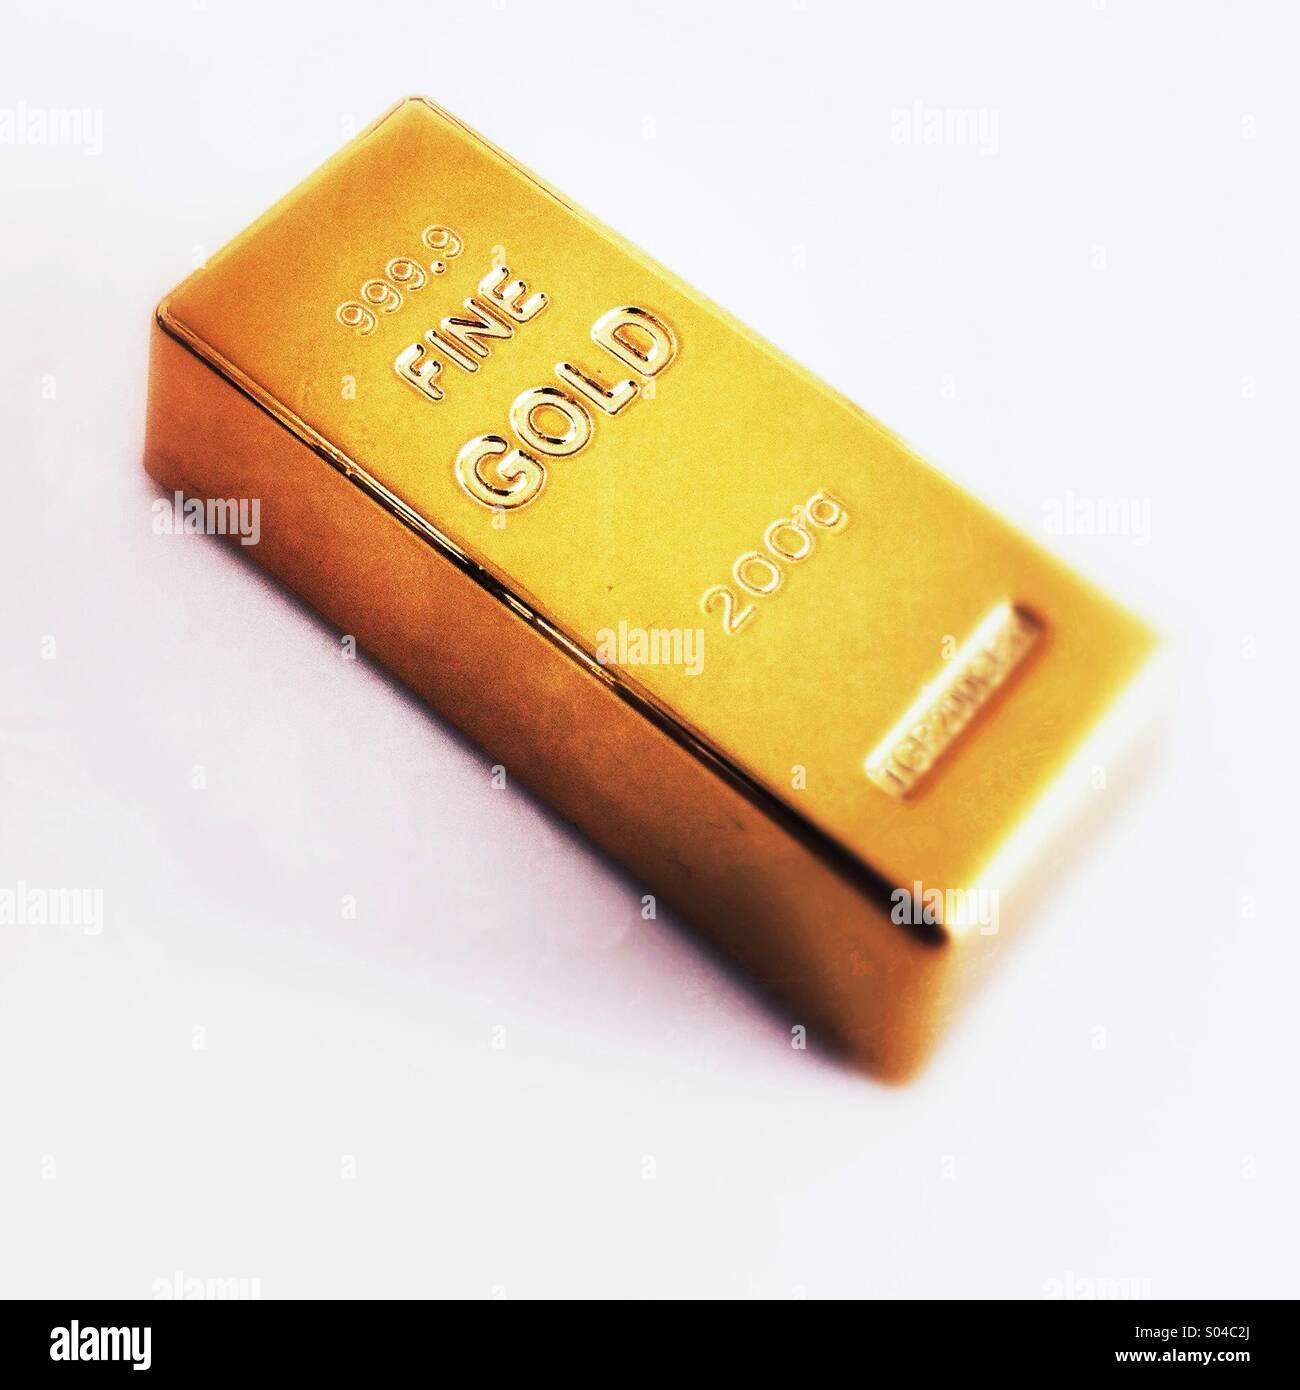 Barra de oro de 200 gramos Imagen De Stock